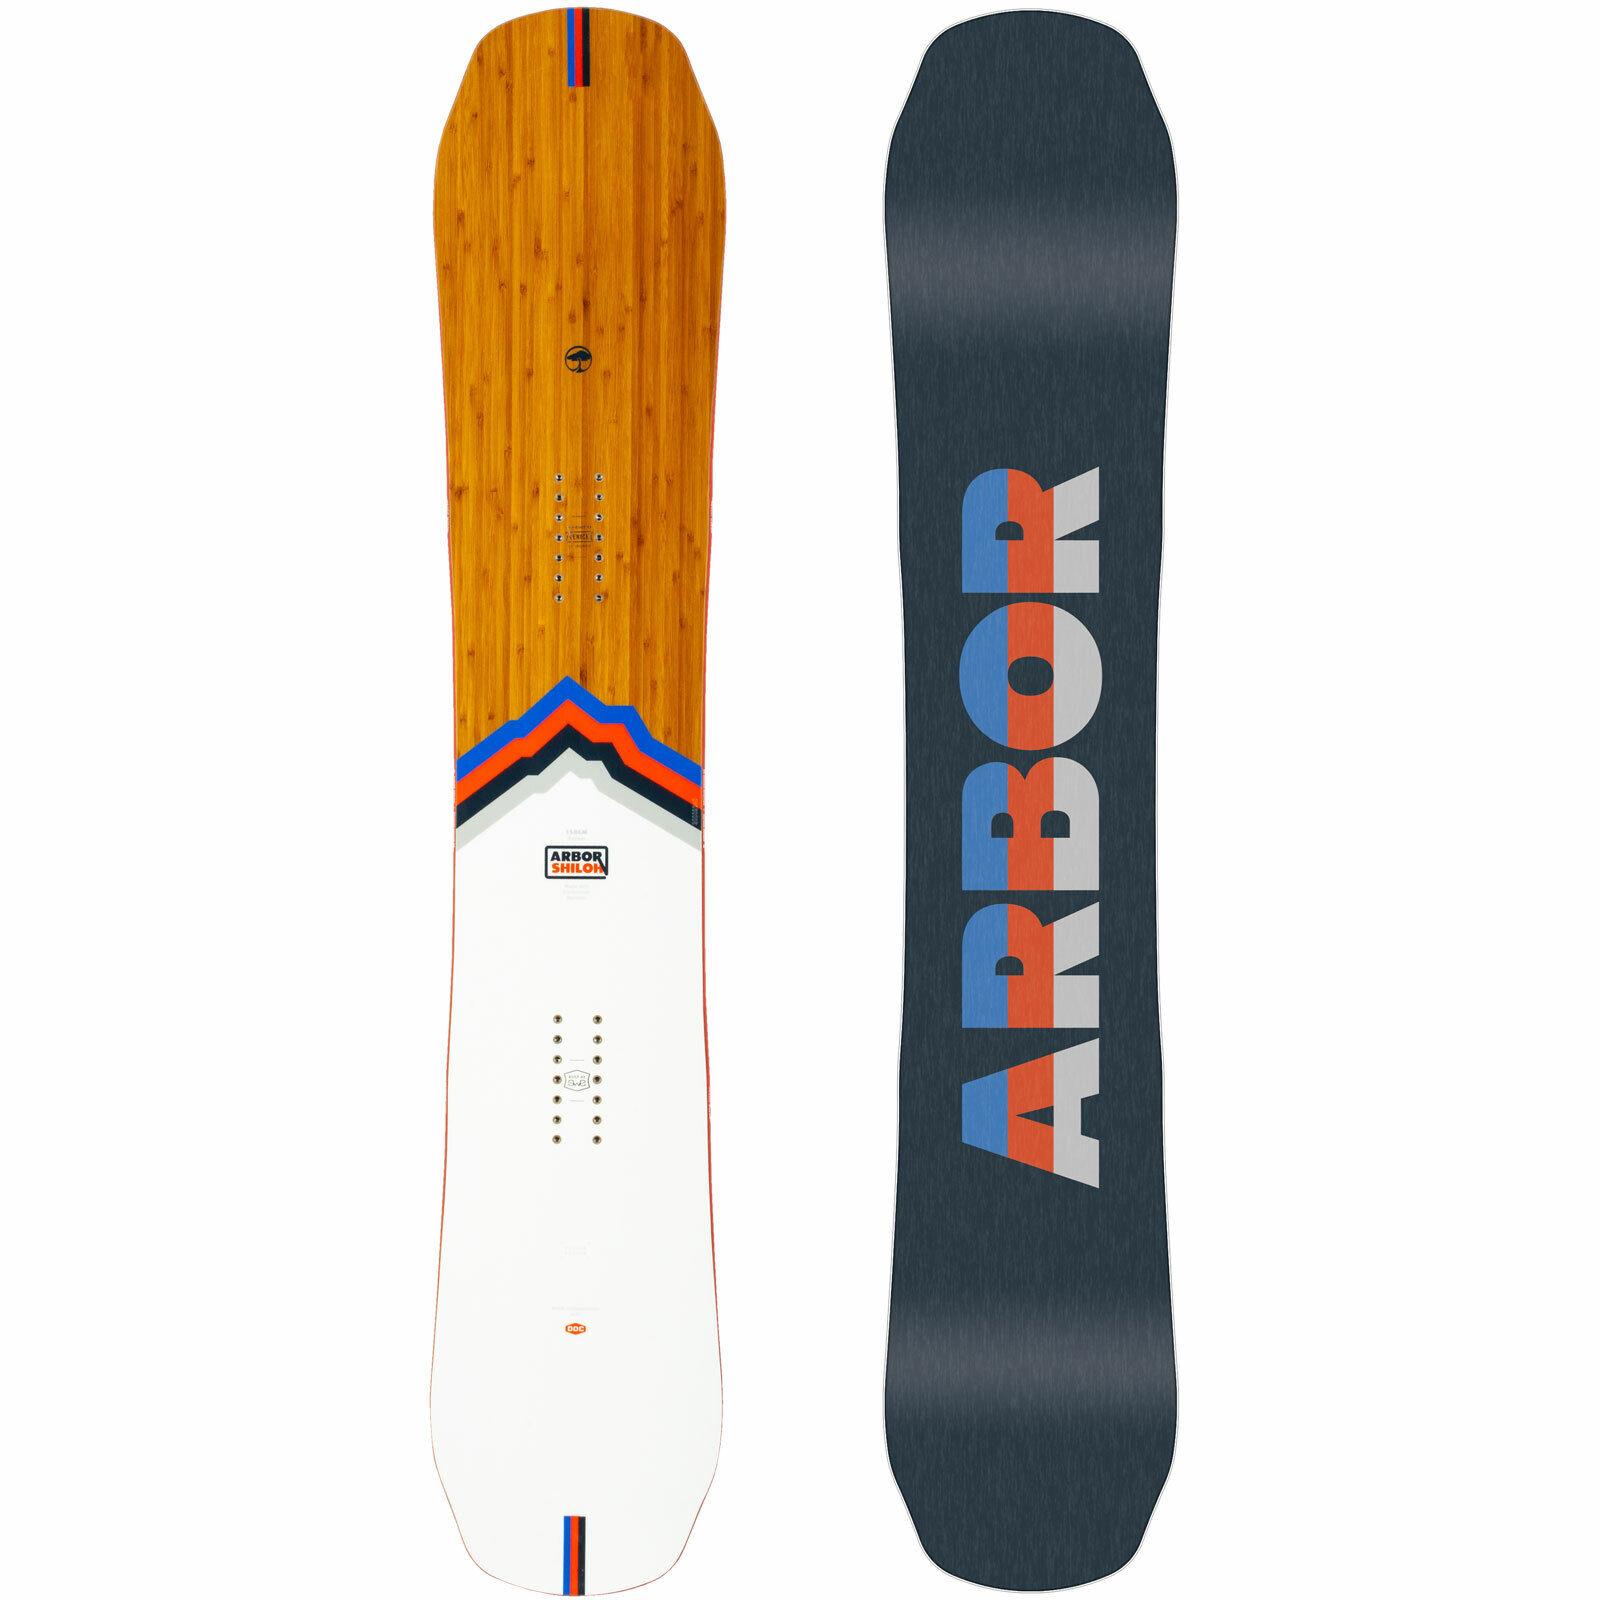 Arbor Shiloh Rocker Herren Snowboard All Mountain Freestyle Twin DDC 2020 NEU